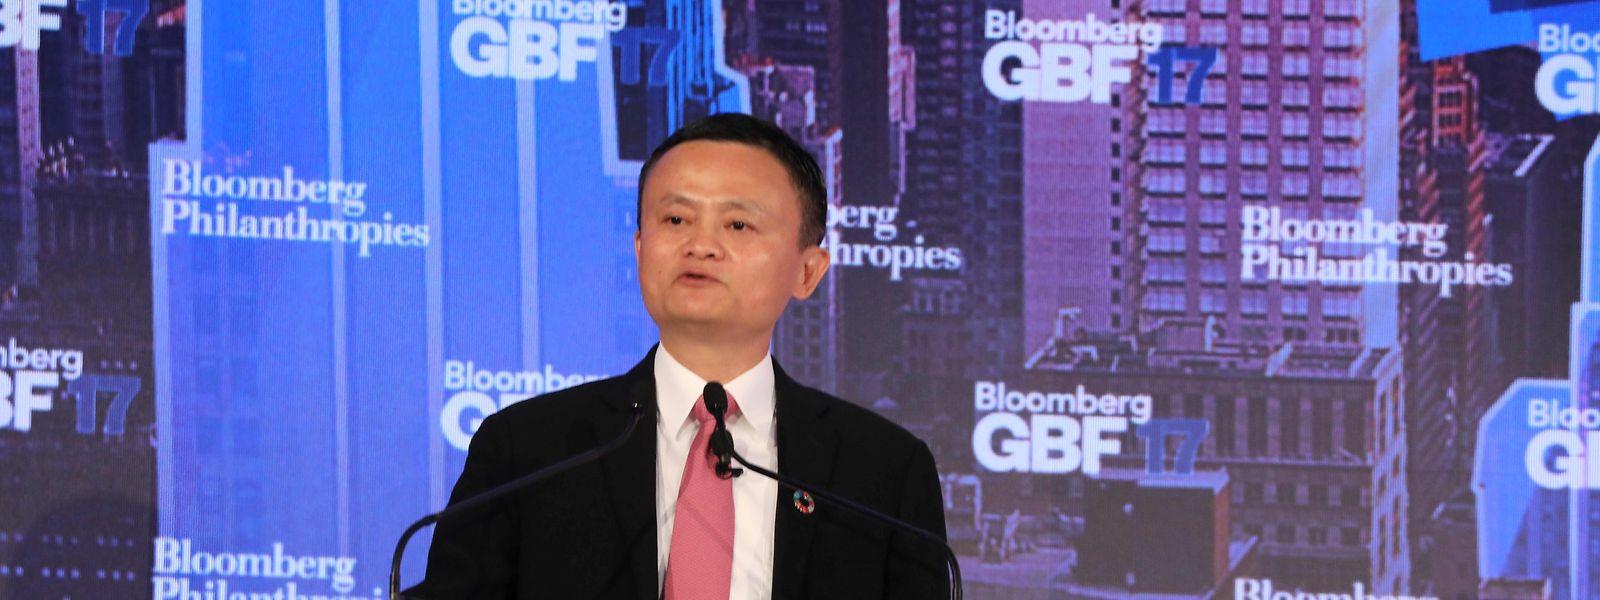 Alibaba-Gründer Jack Ma beim Global Bloomberg Business Forum in New York.